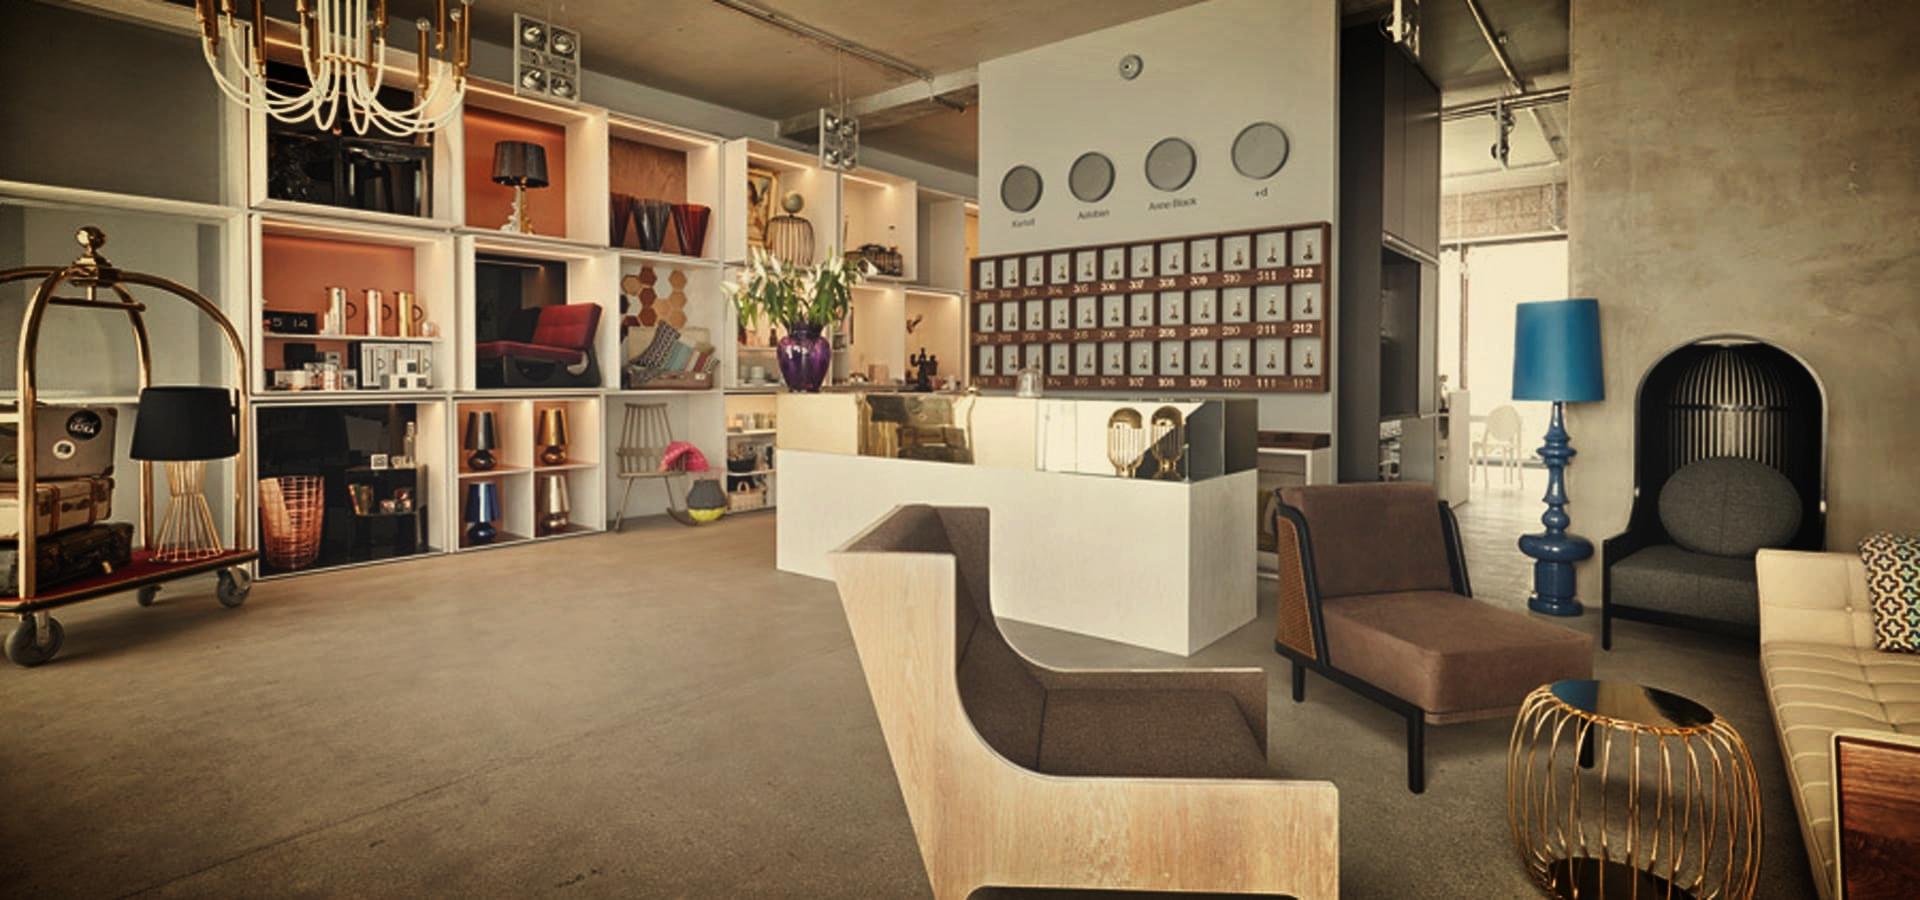 SLEEP_ SHOP_  ULTRA.  #ConceptStore #ConceptHotel #Designer #Brands&Style   https://www.hotelultra.de